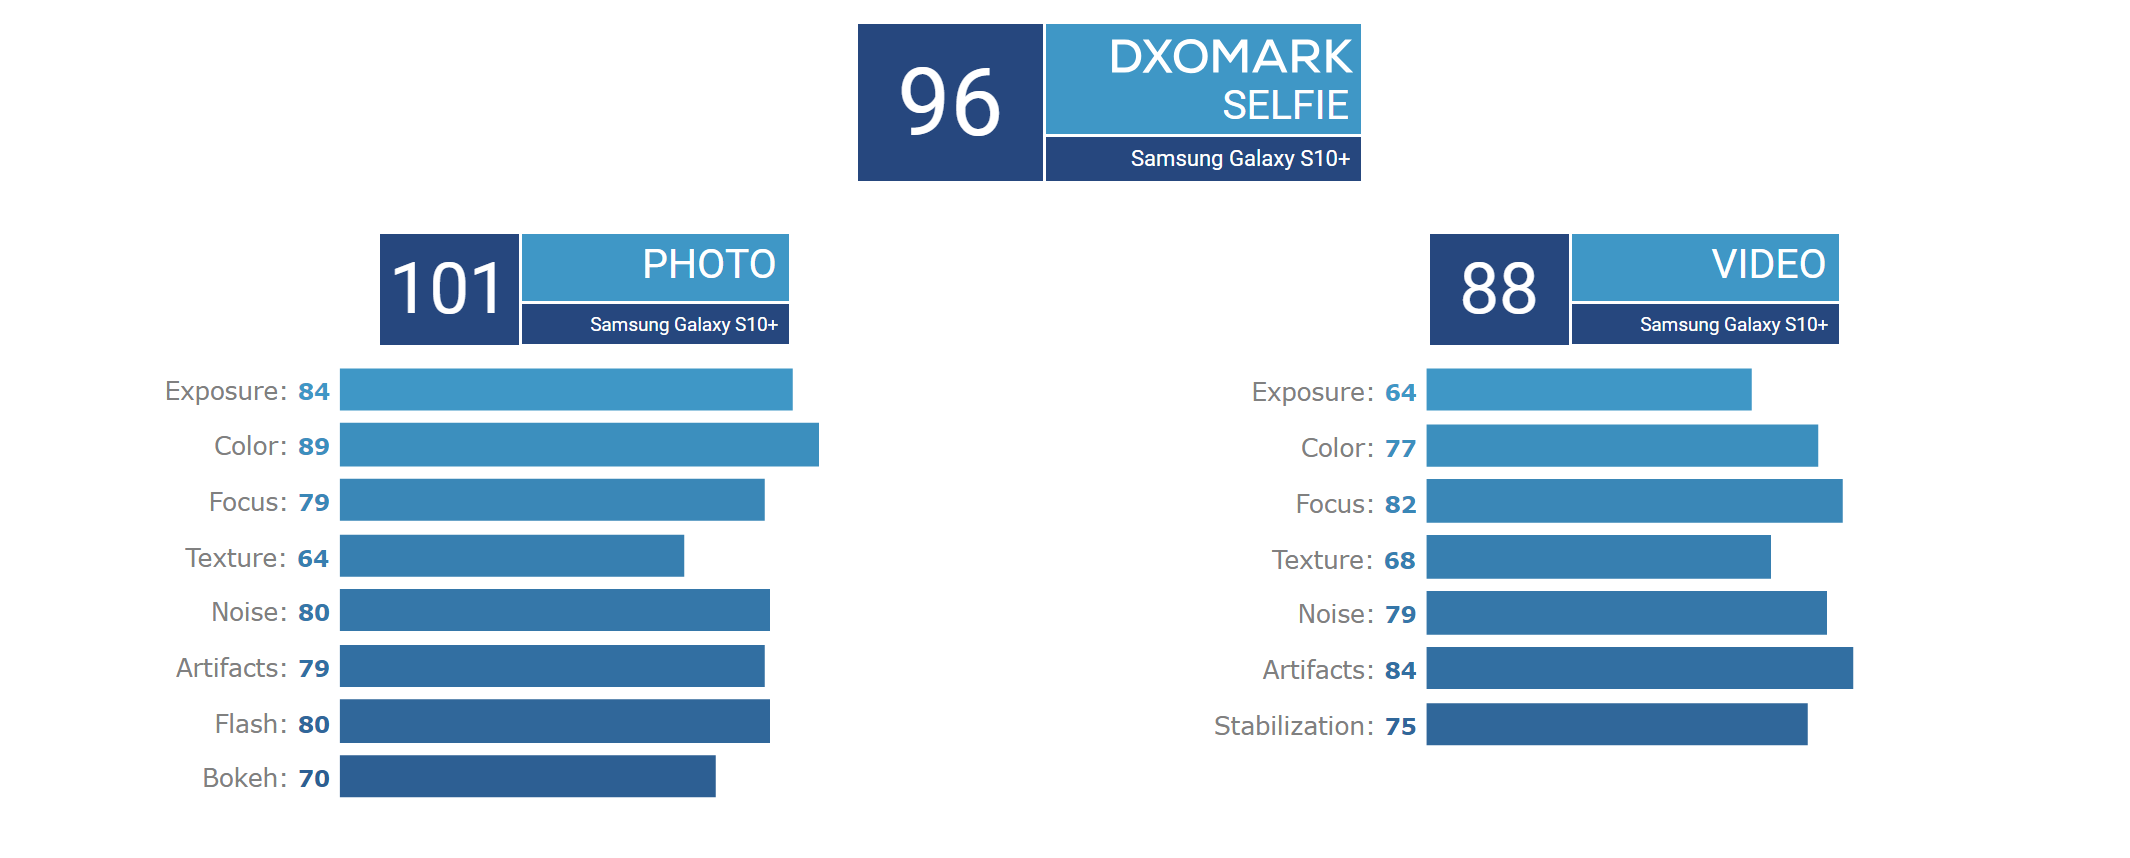 Galaxy S10+ DxOMark selfie scores